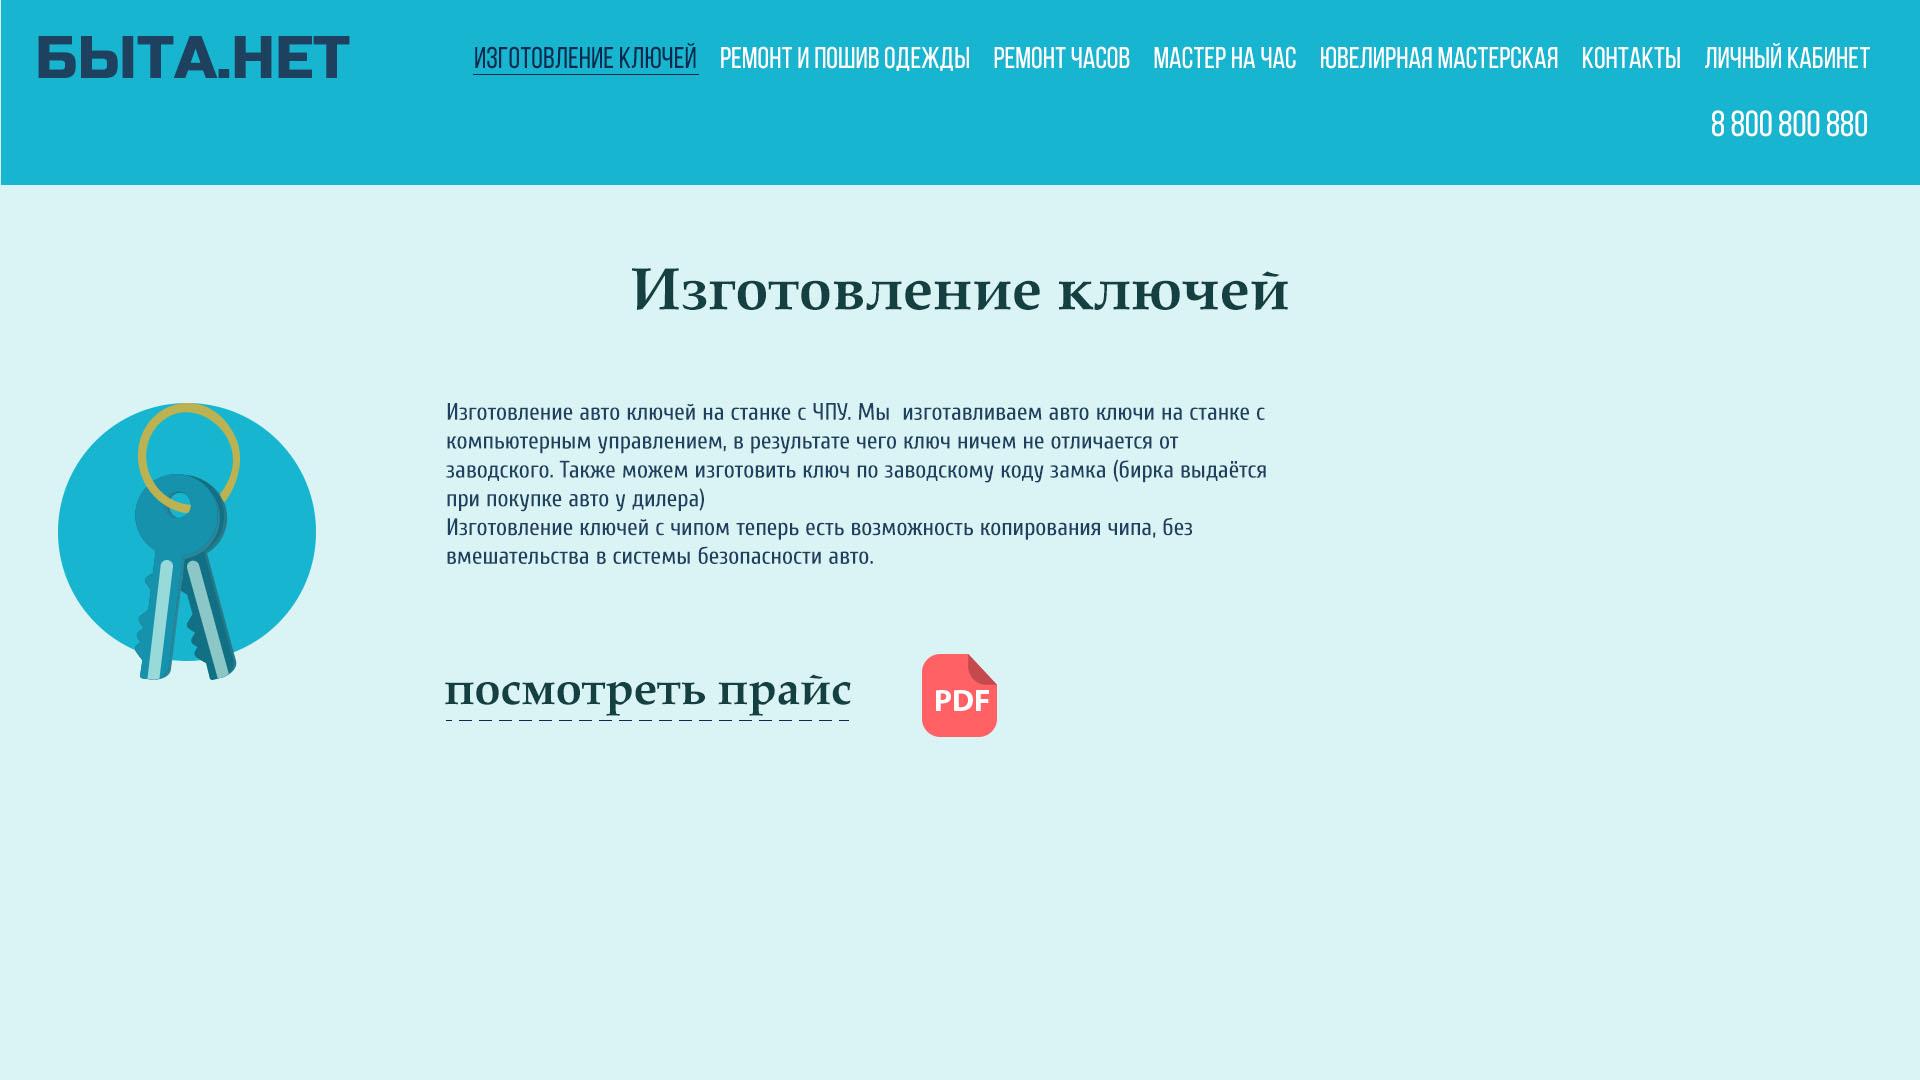 Нужно нарисовать дизайн сайта услуг фото f_7945c5c9668e429e.jpg